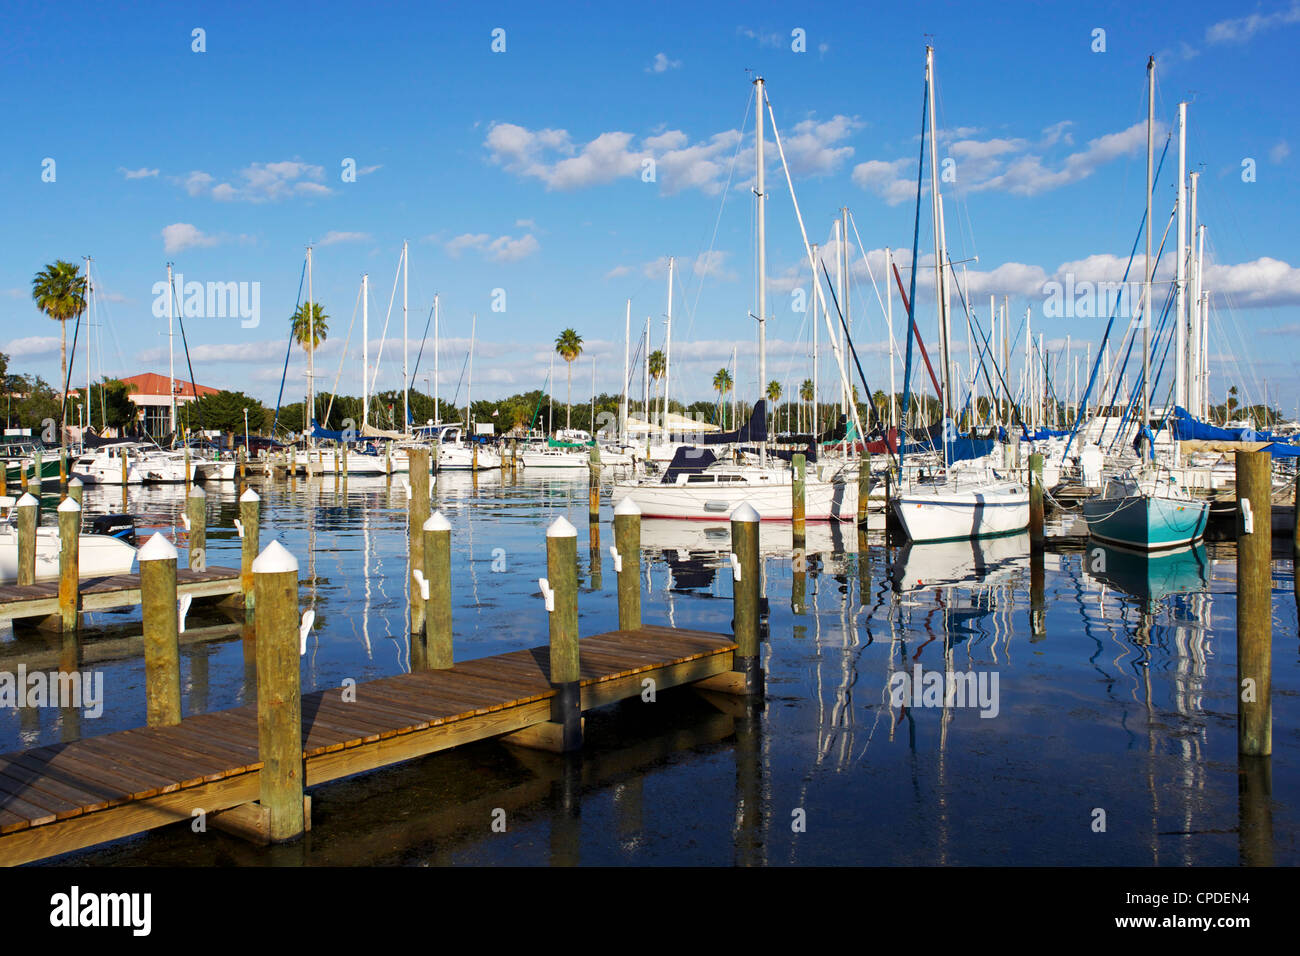 Marina, St. Petersburg, Gulf Coast, Florida, United States of America, North America - Stock Image